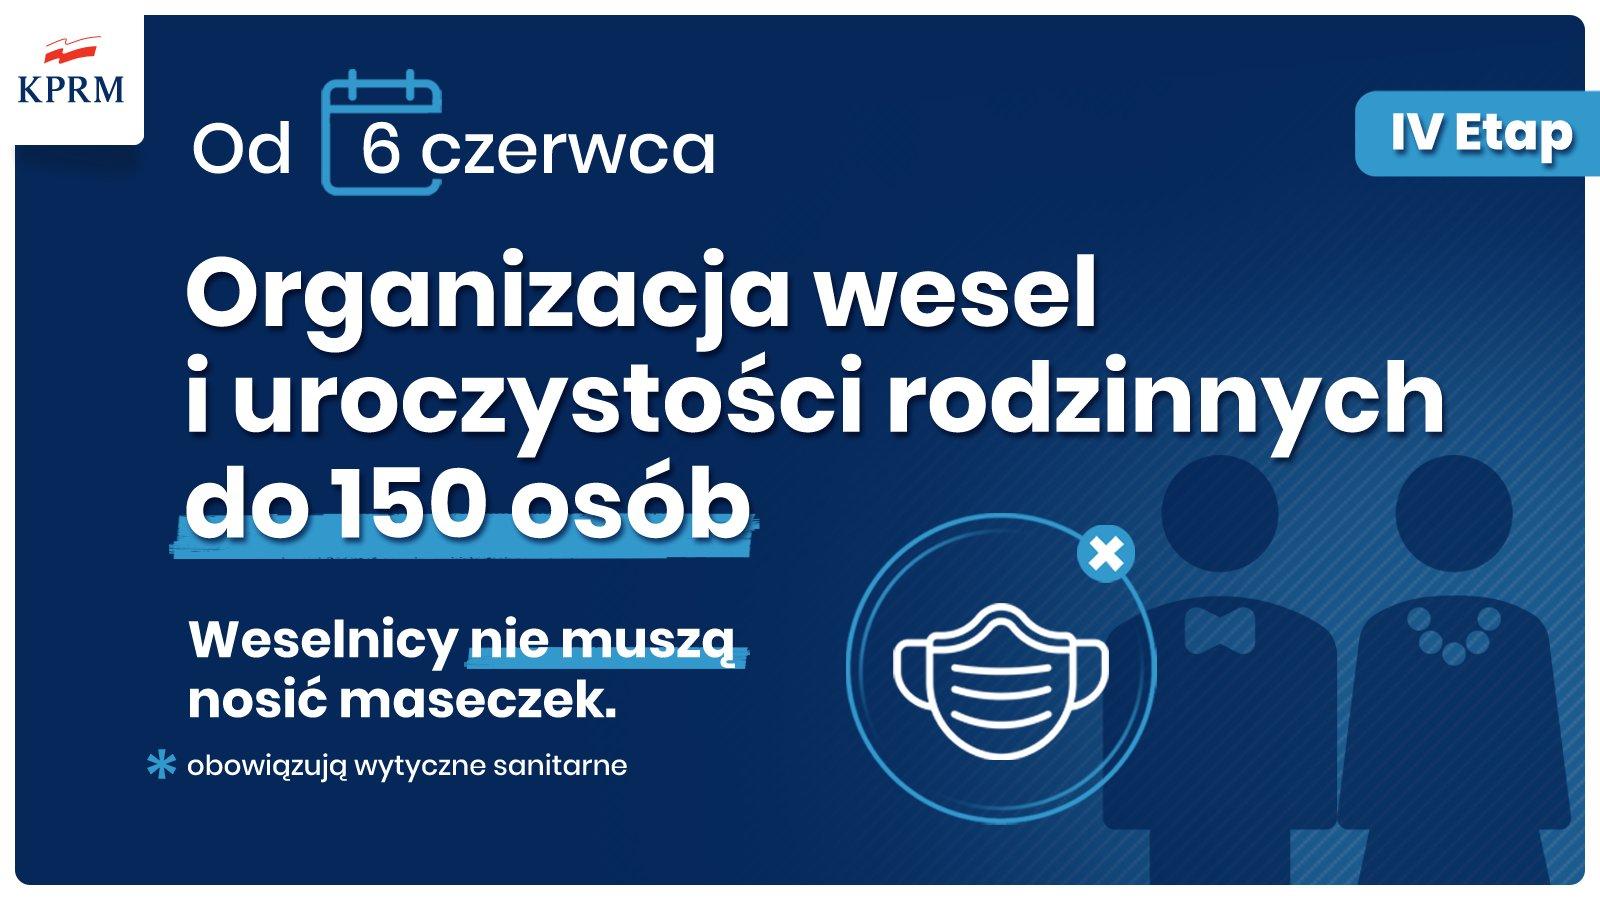 http://m.82-200.pl/2020/05/orig/covid03-6004.jpg